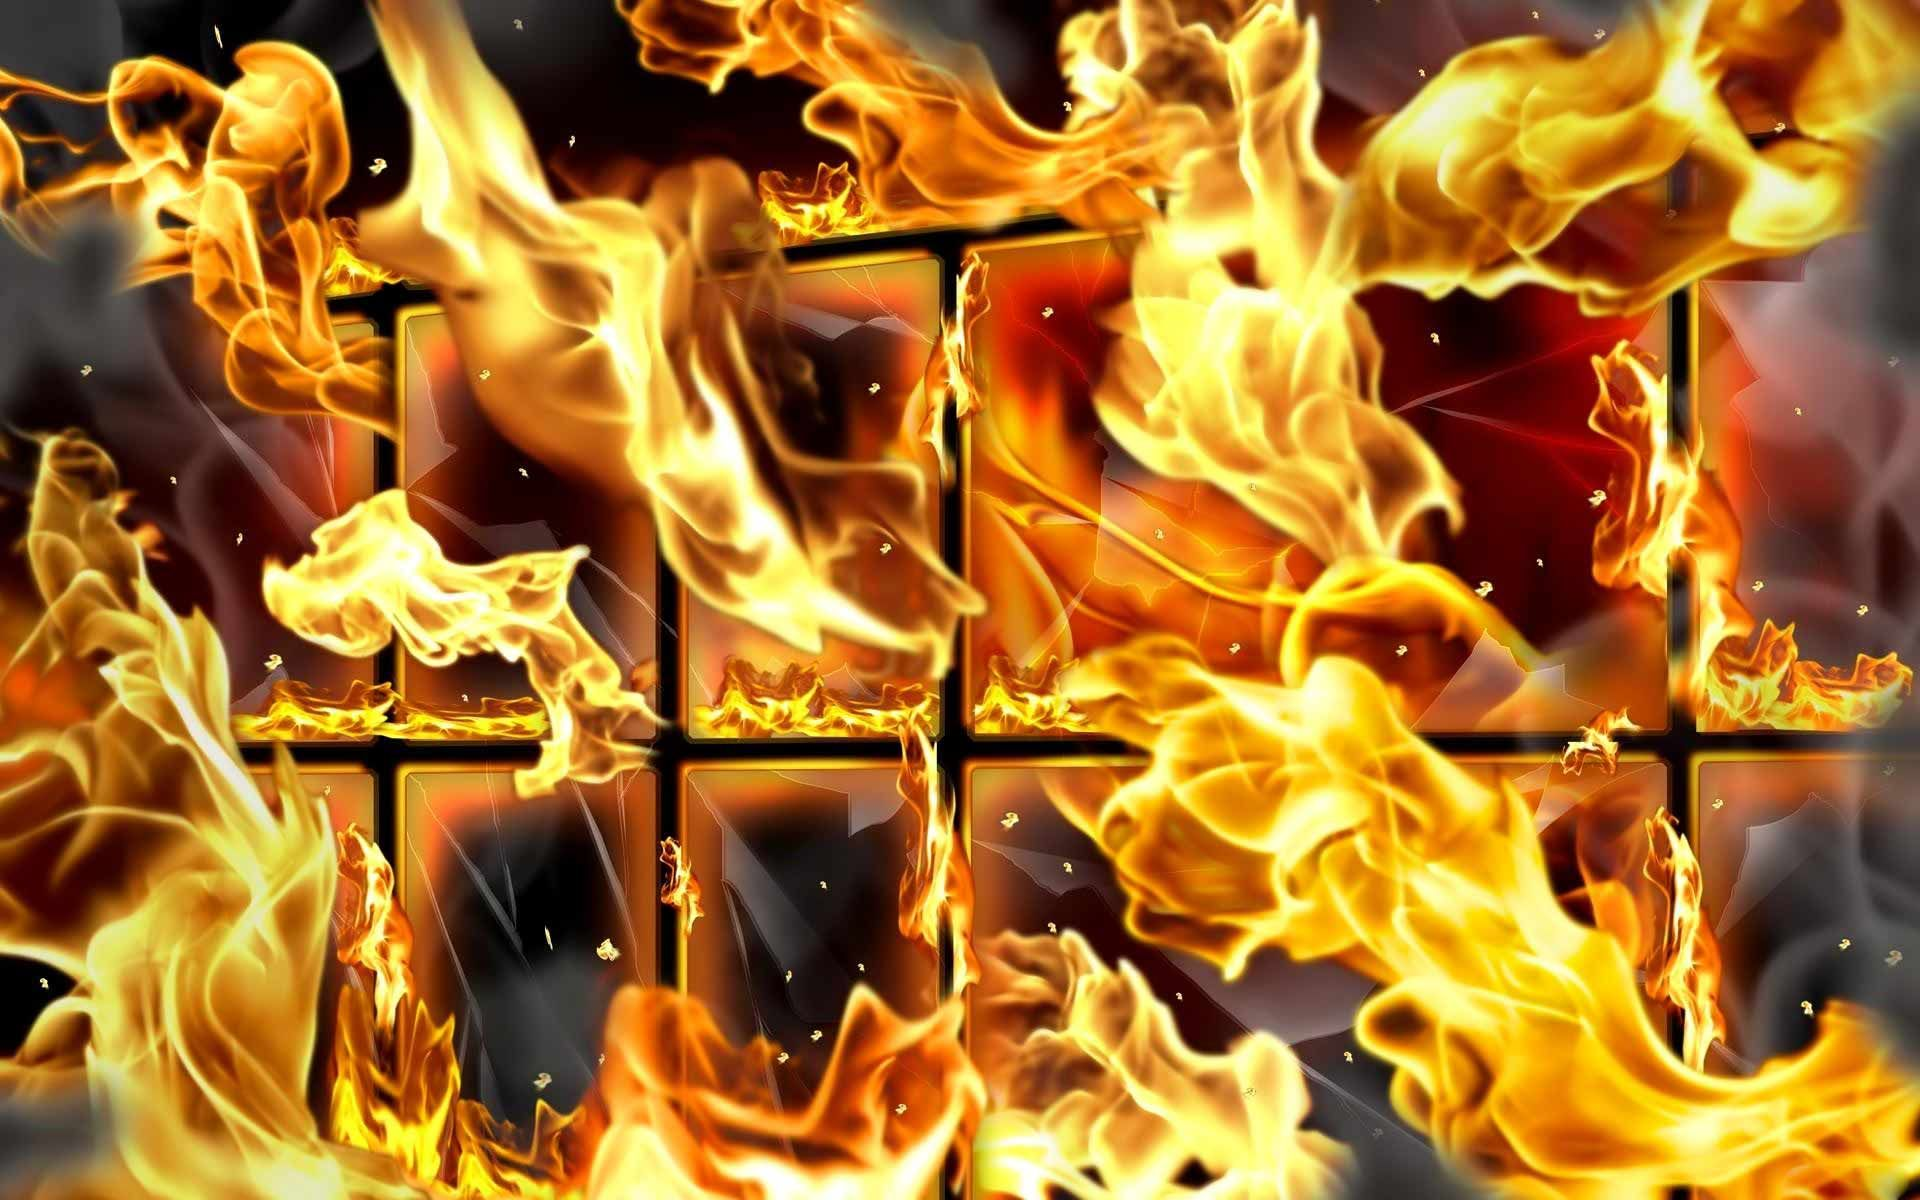 Pin Oleh Bloghuts Com Di Fire Fascination